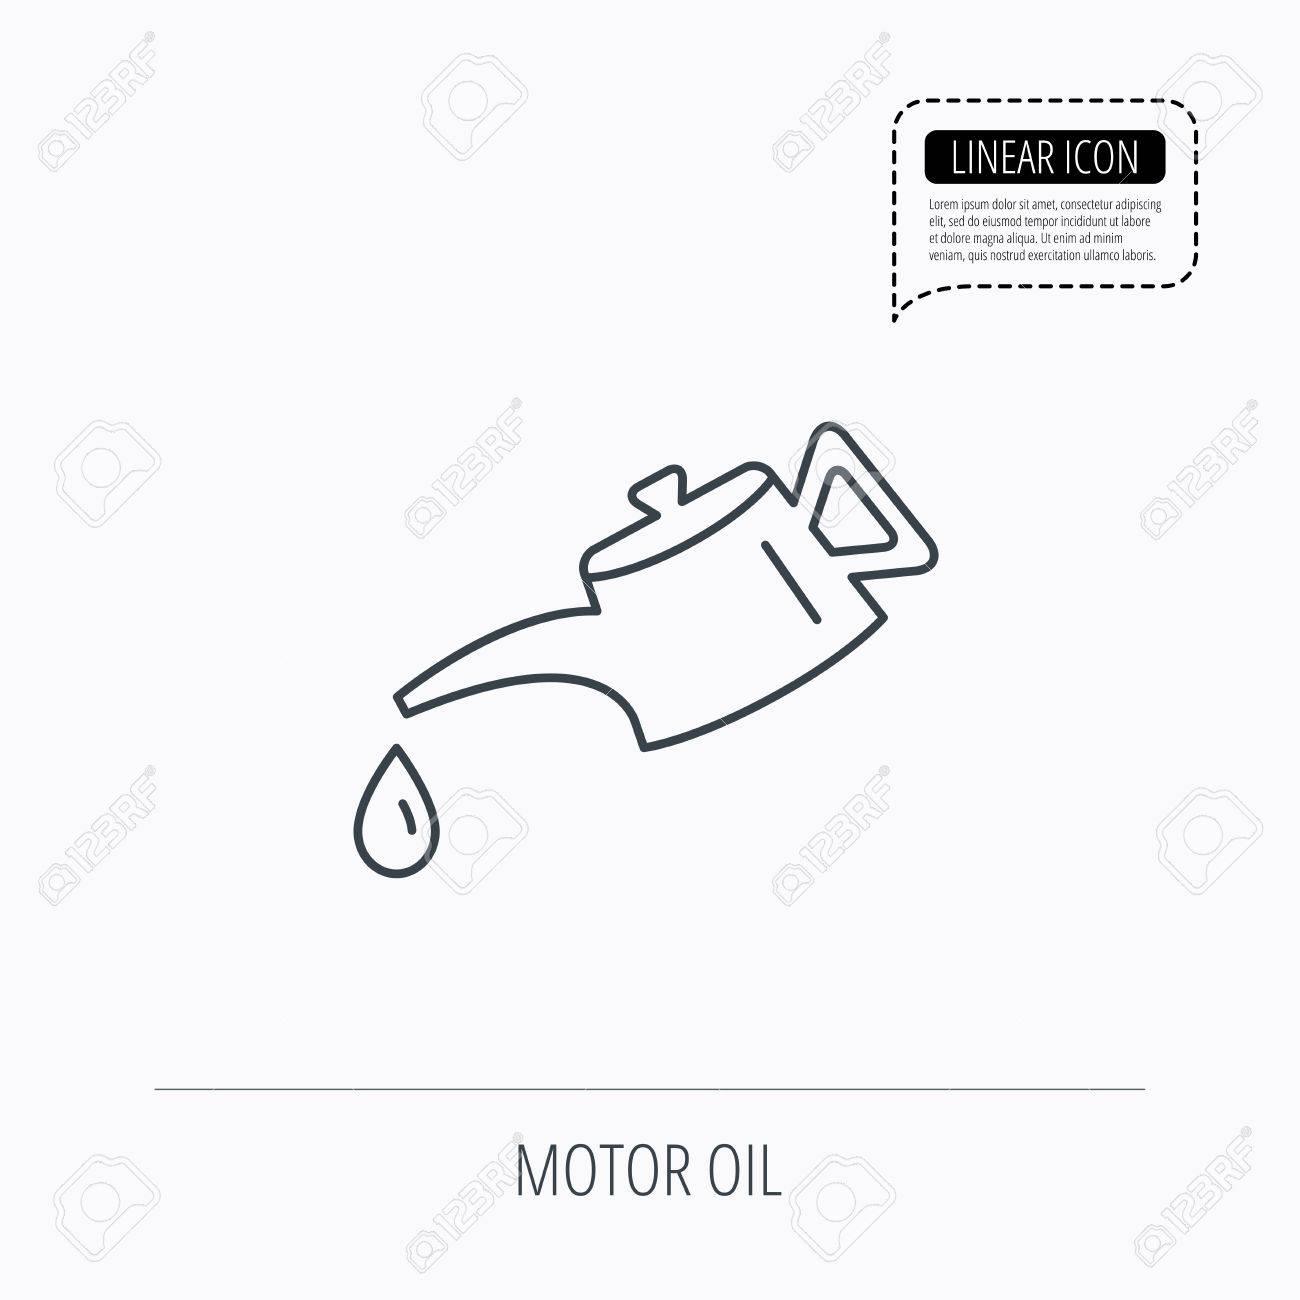 Motor Olie Pictogram Brandstof Kan Met Drop Teken Lineaire